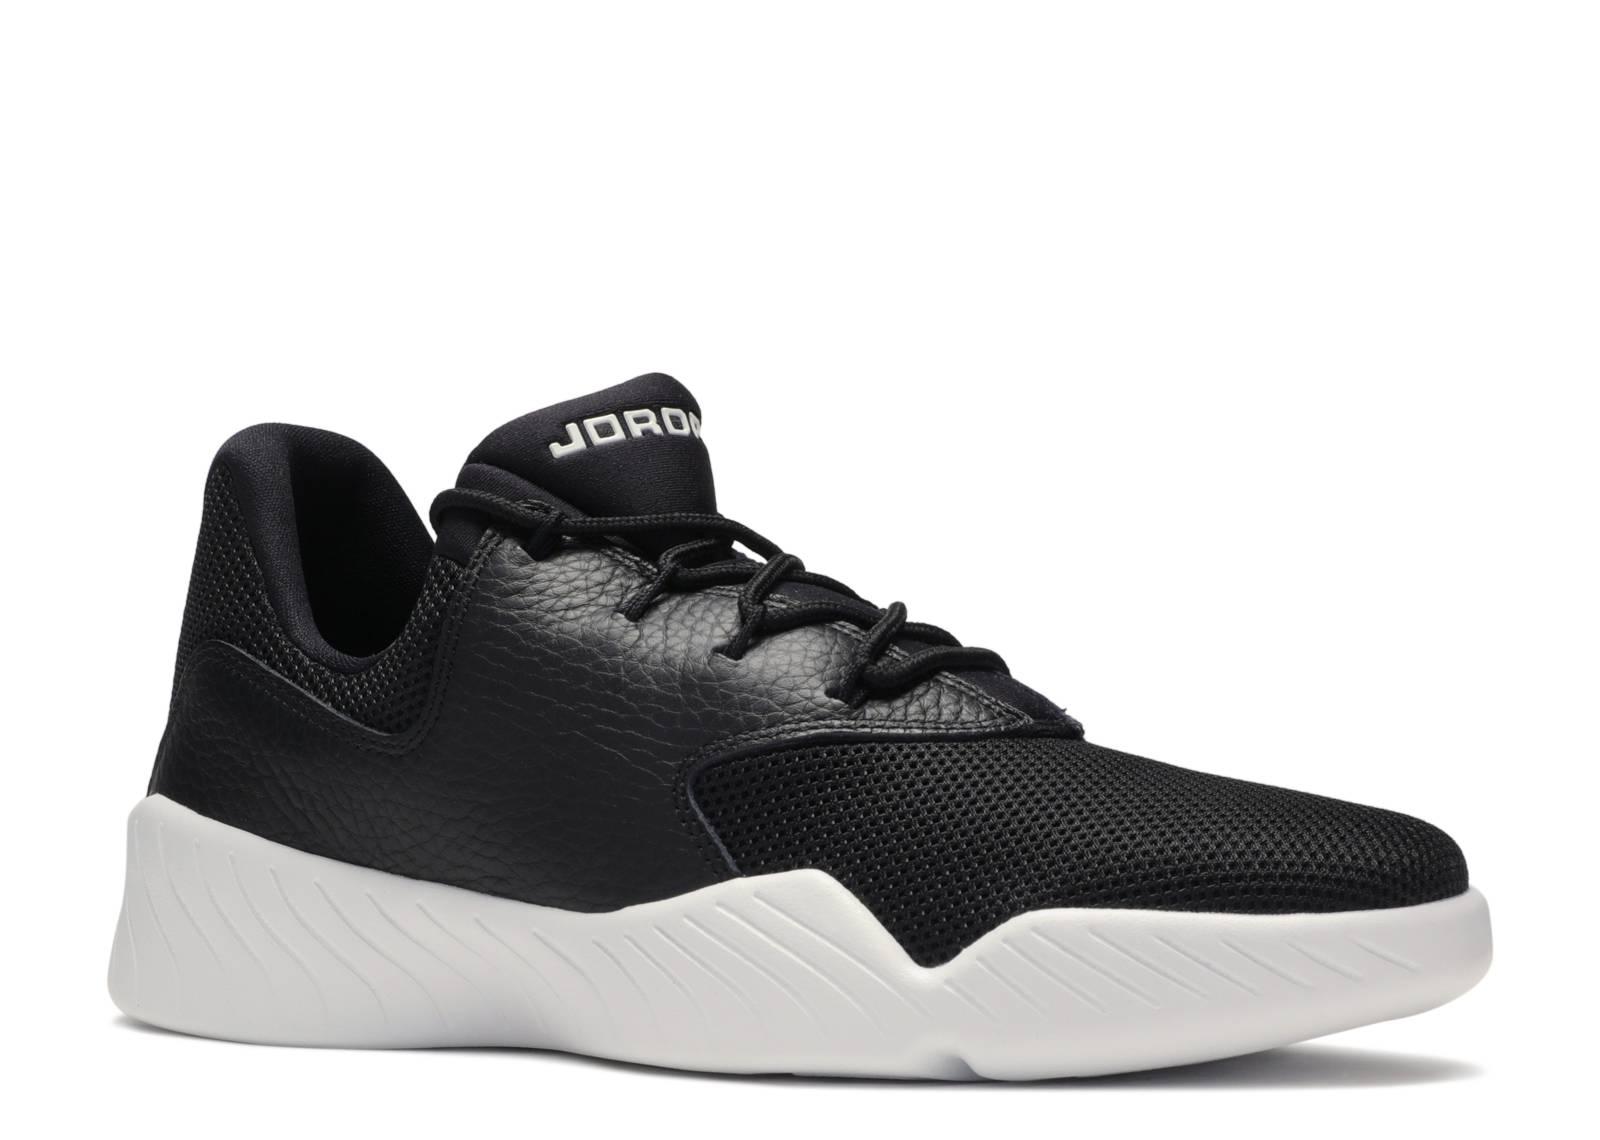 Black White' - Air Jordan - 905288 010